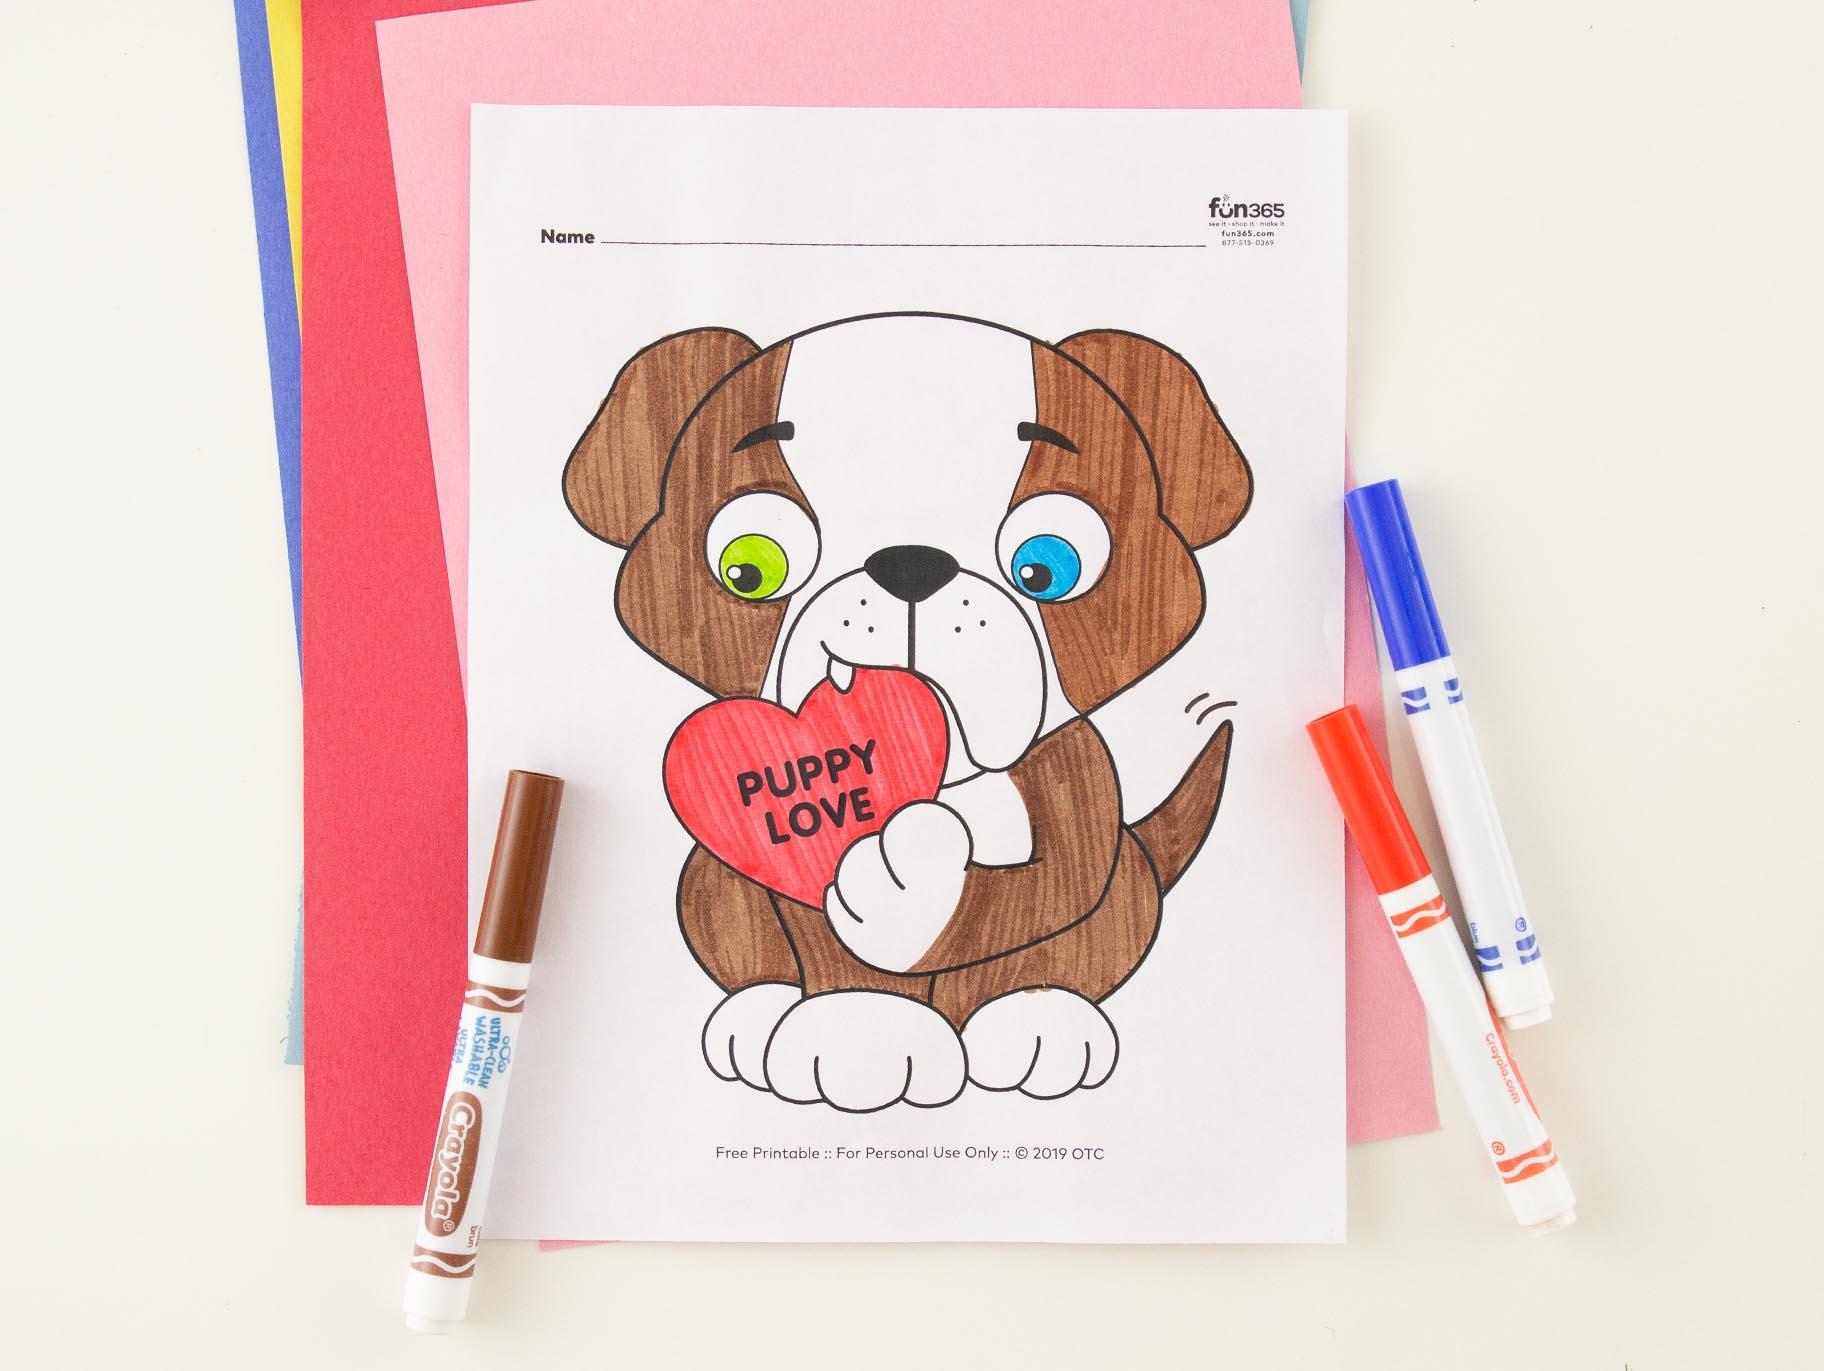 Valentine Dog Coloring Page Free Printable Fun365